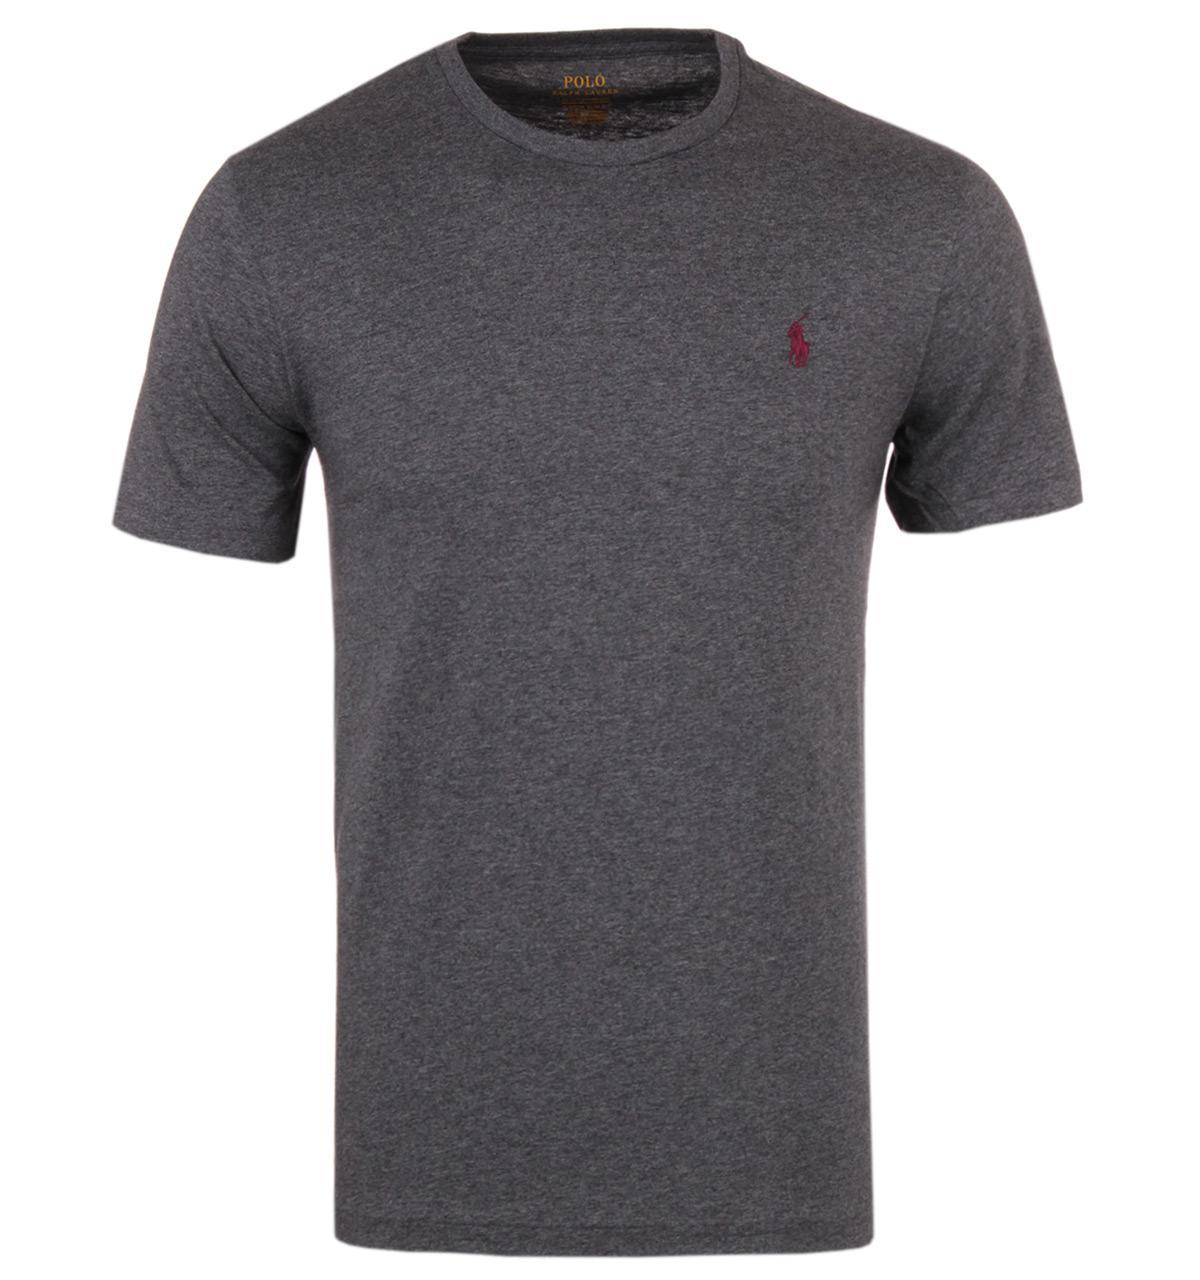 Lyst polo ralph lauren stadium grey heather custom fit t for Polo custom fit t shirts